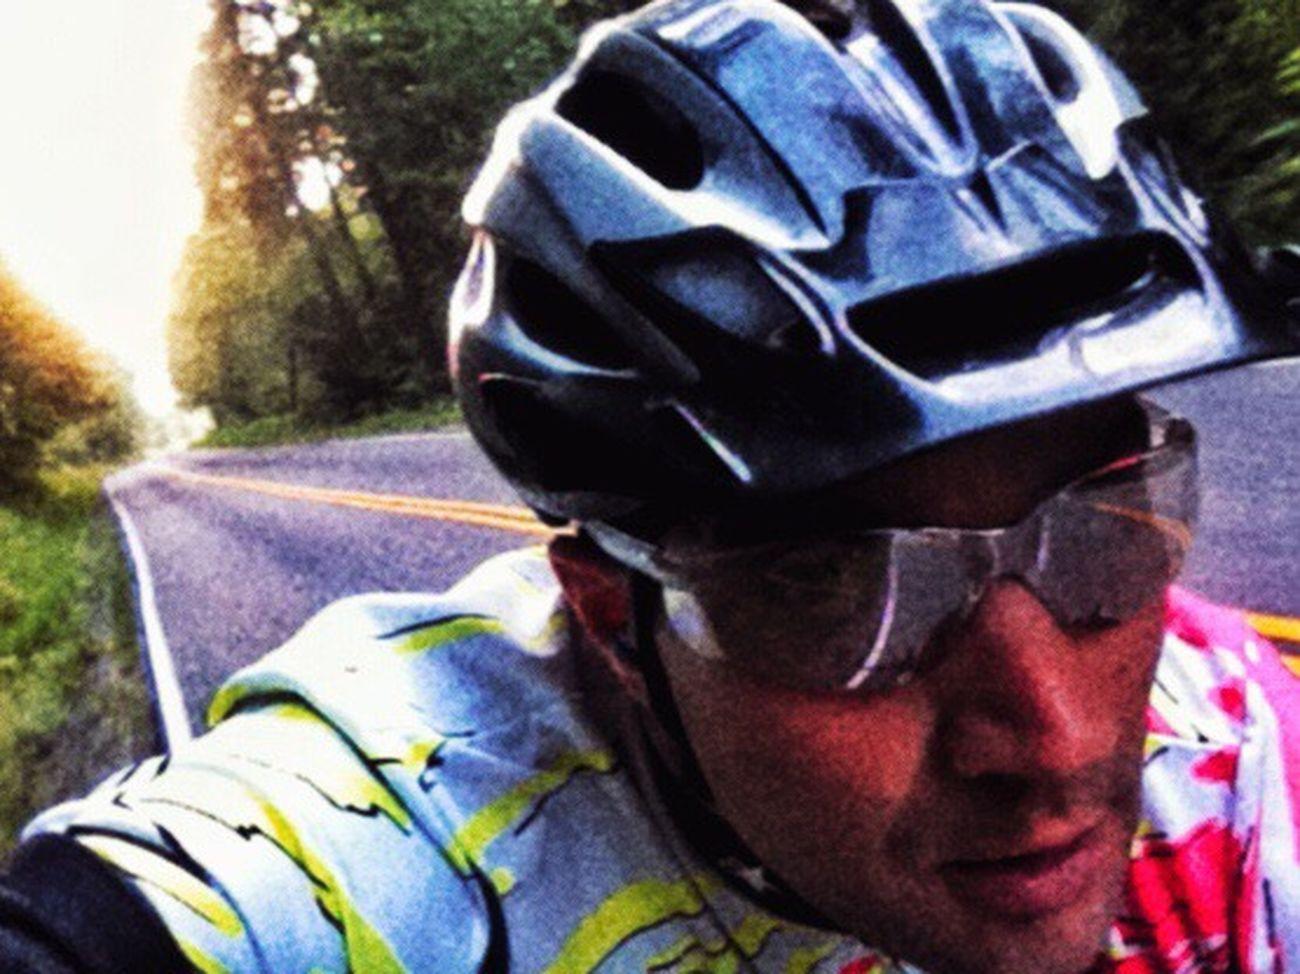 Focus. On The Bike On My Bike Cycling Biking Sweating It Out Self-serving Selfie